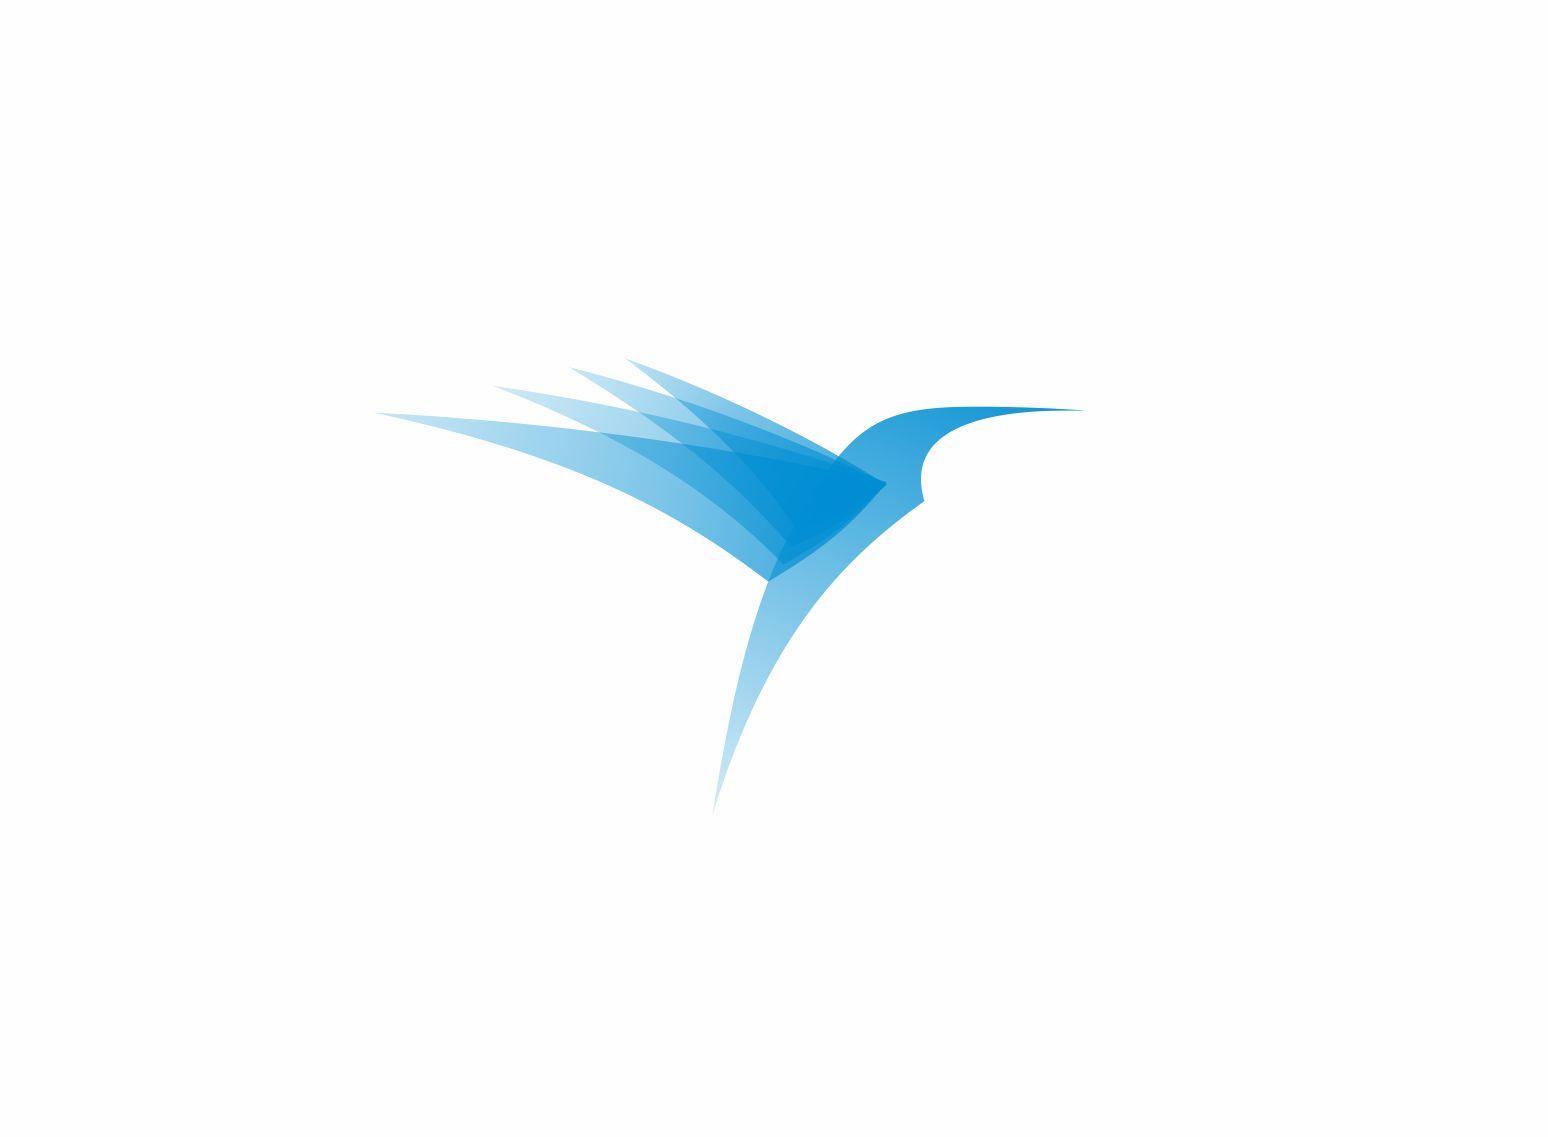 Дизайнер, разработка логотипа компании фото f_379557fef07c0c10.jpg